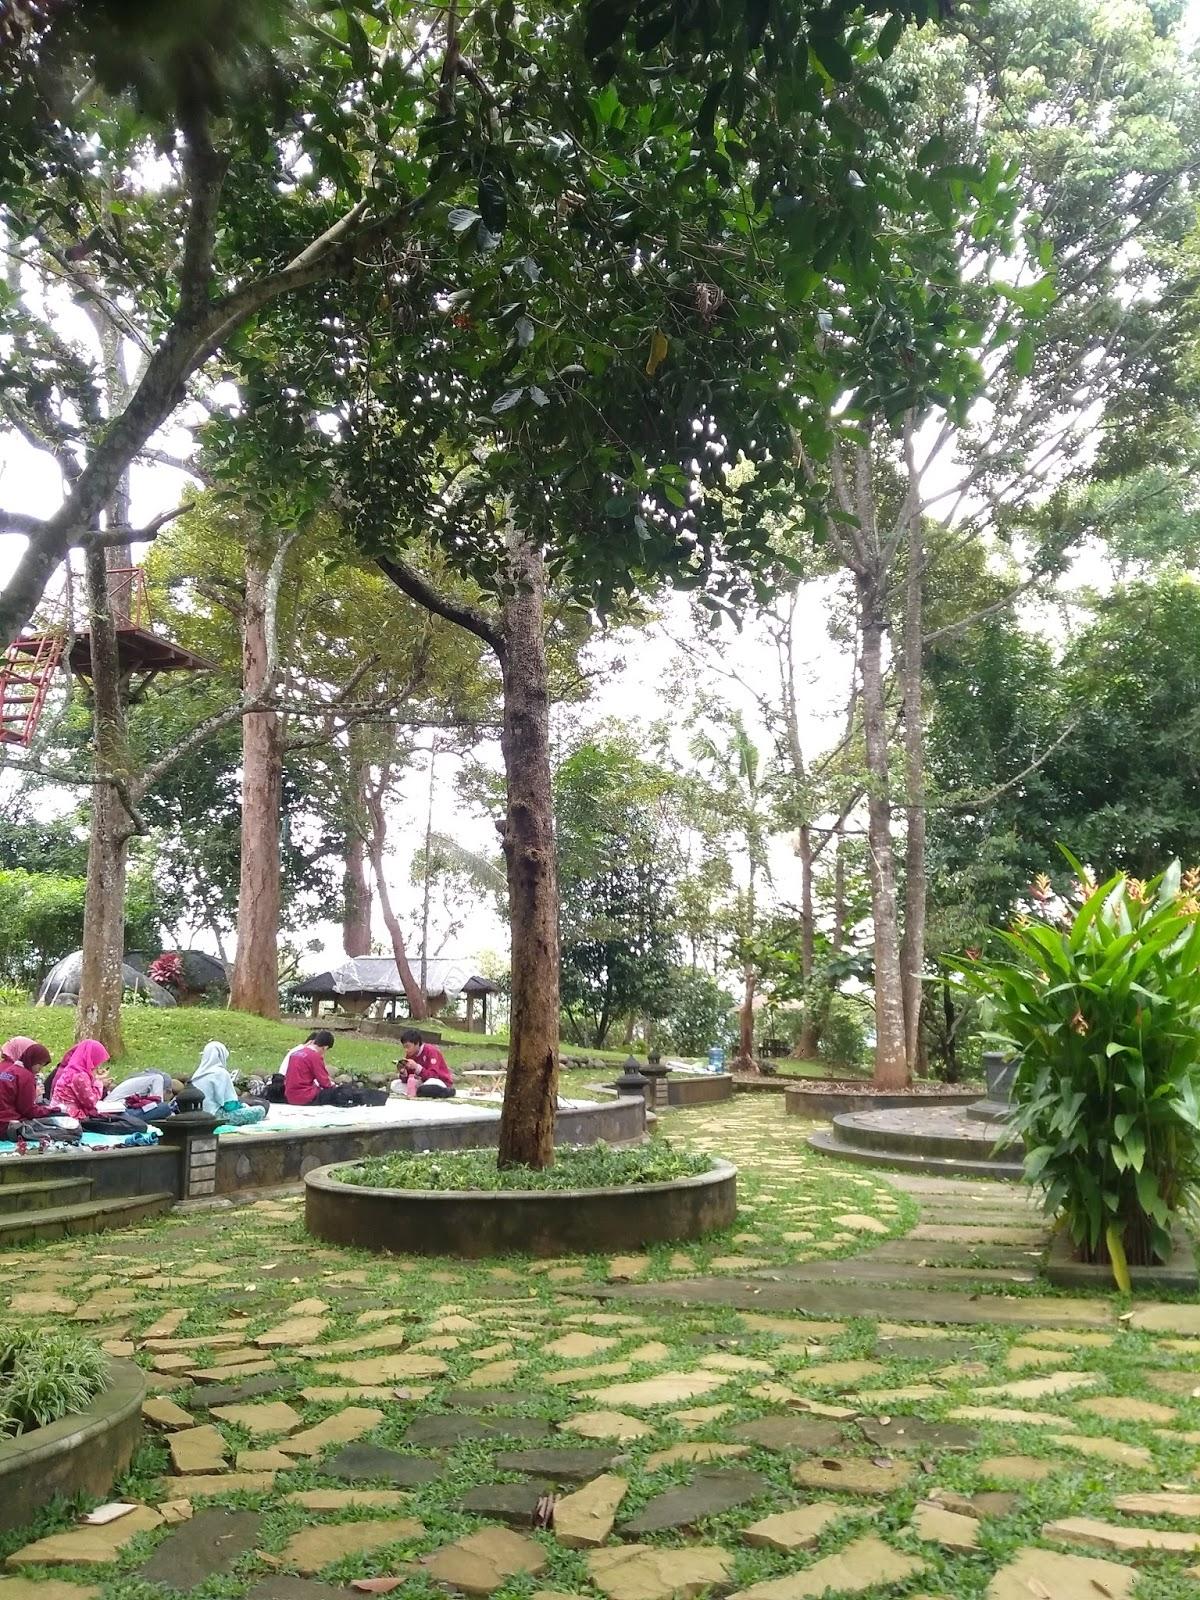 Semarang Coret Kebun Durian Watu Simbar Gunungpati Wisata Edukasi Kab